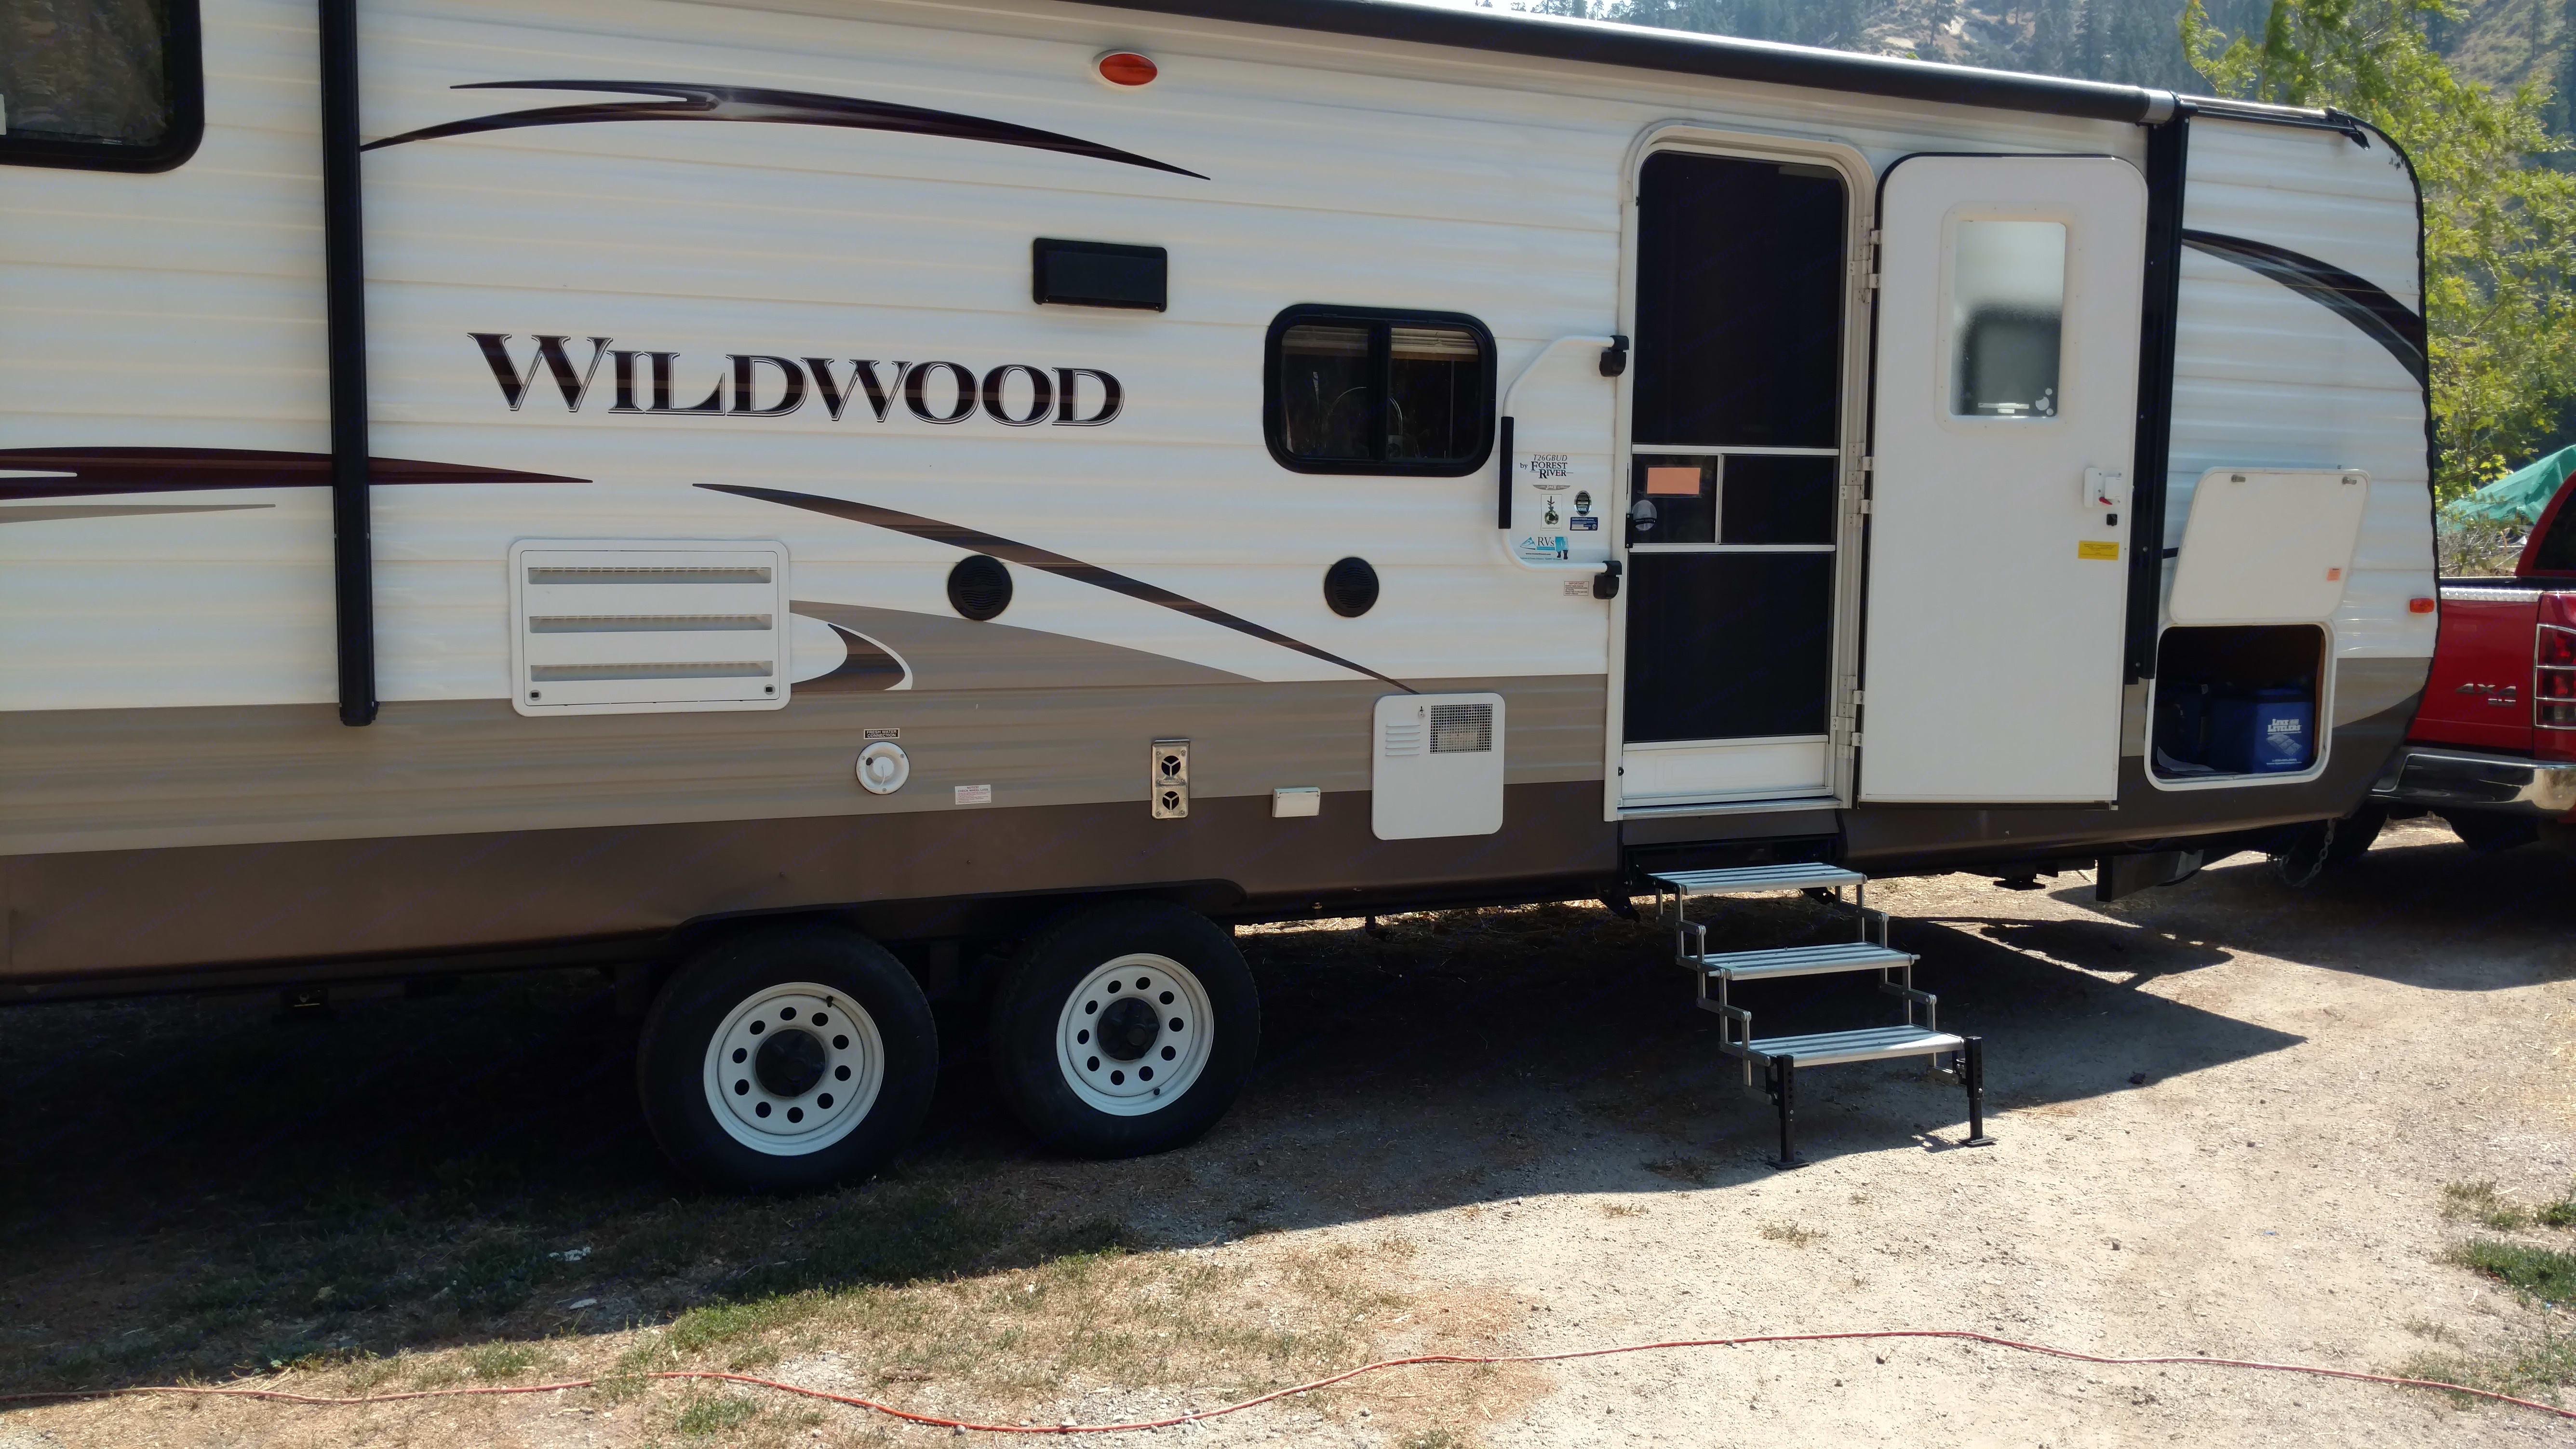 26' travel trailer. Sleeps 8.. Forest River Wildwood 2014